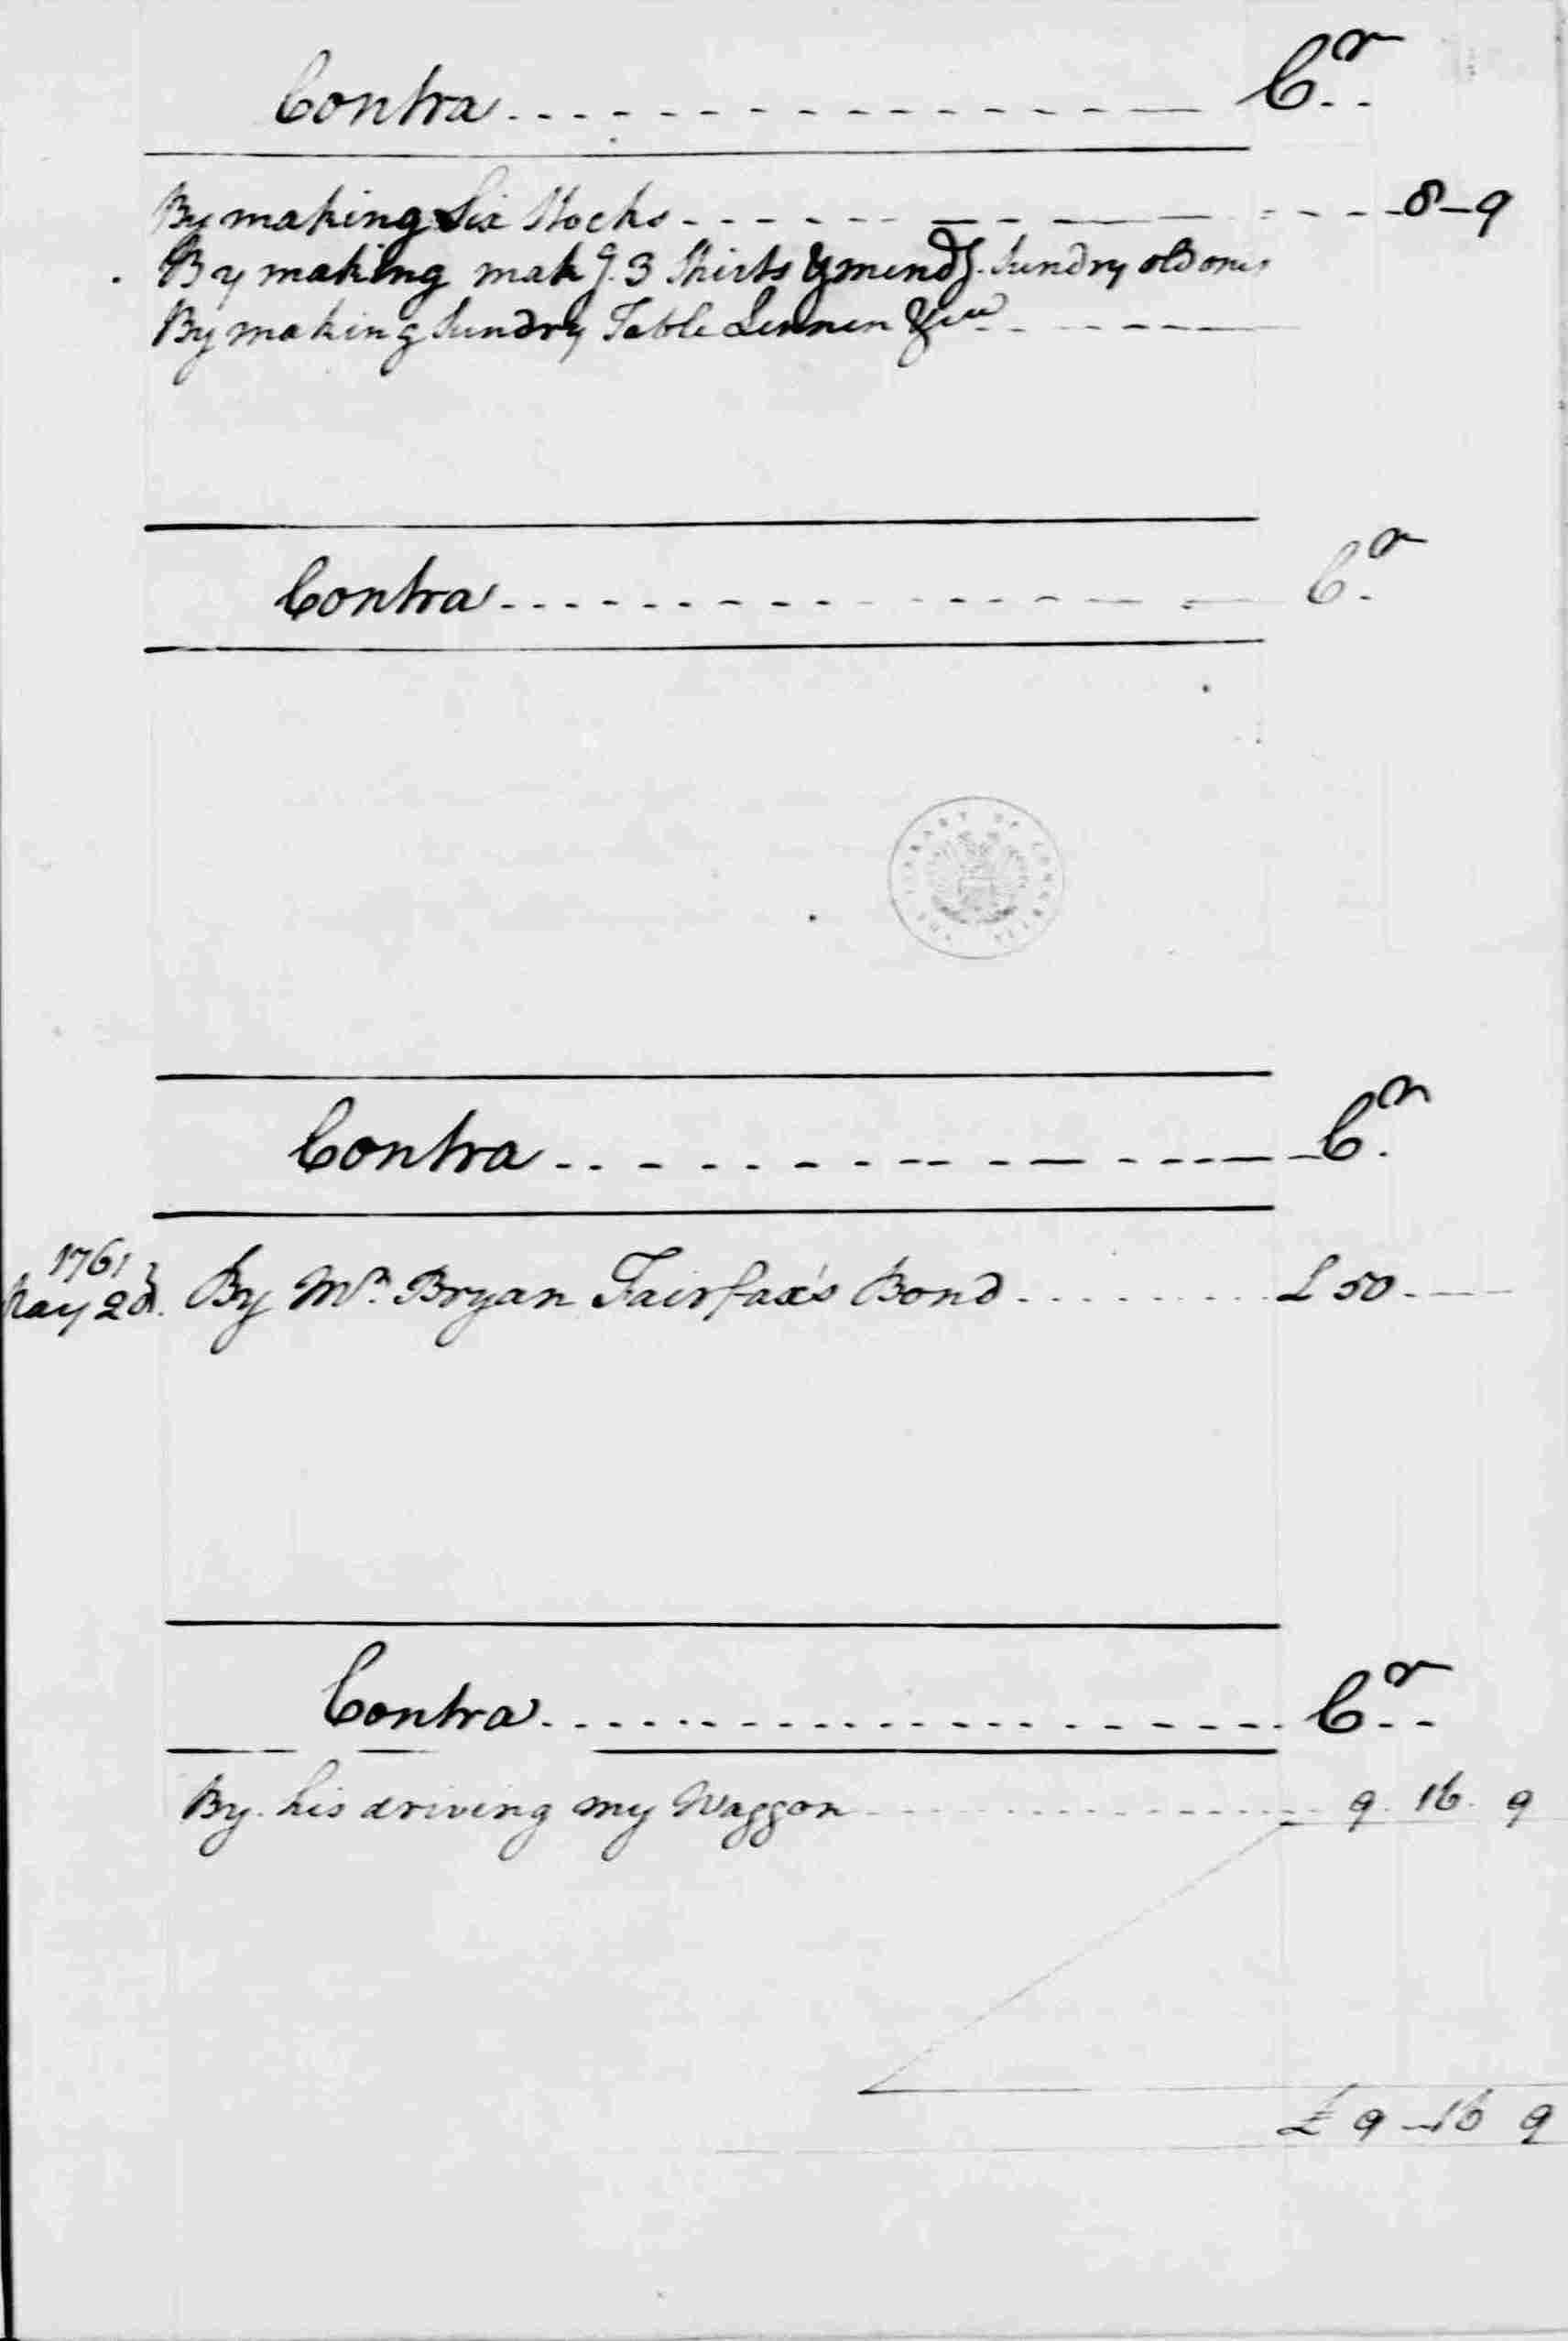 Ledger A, folio 50, right side